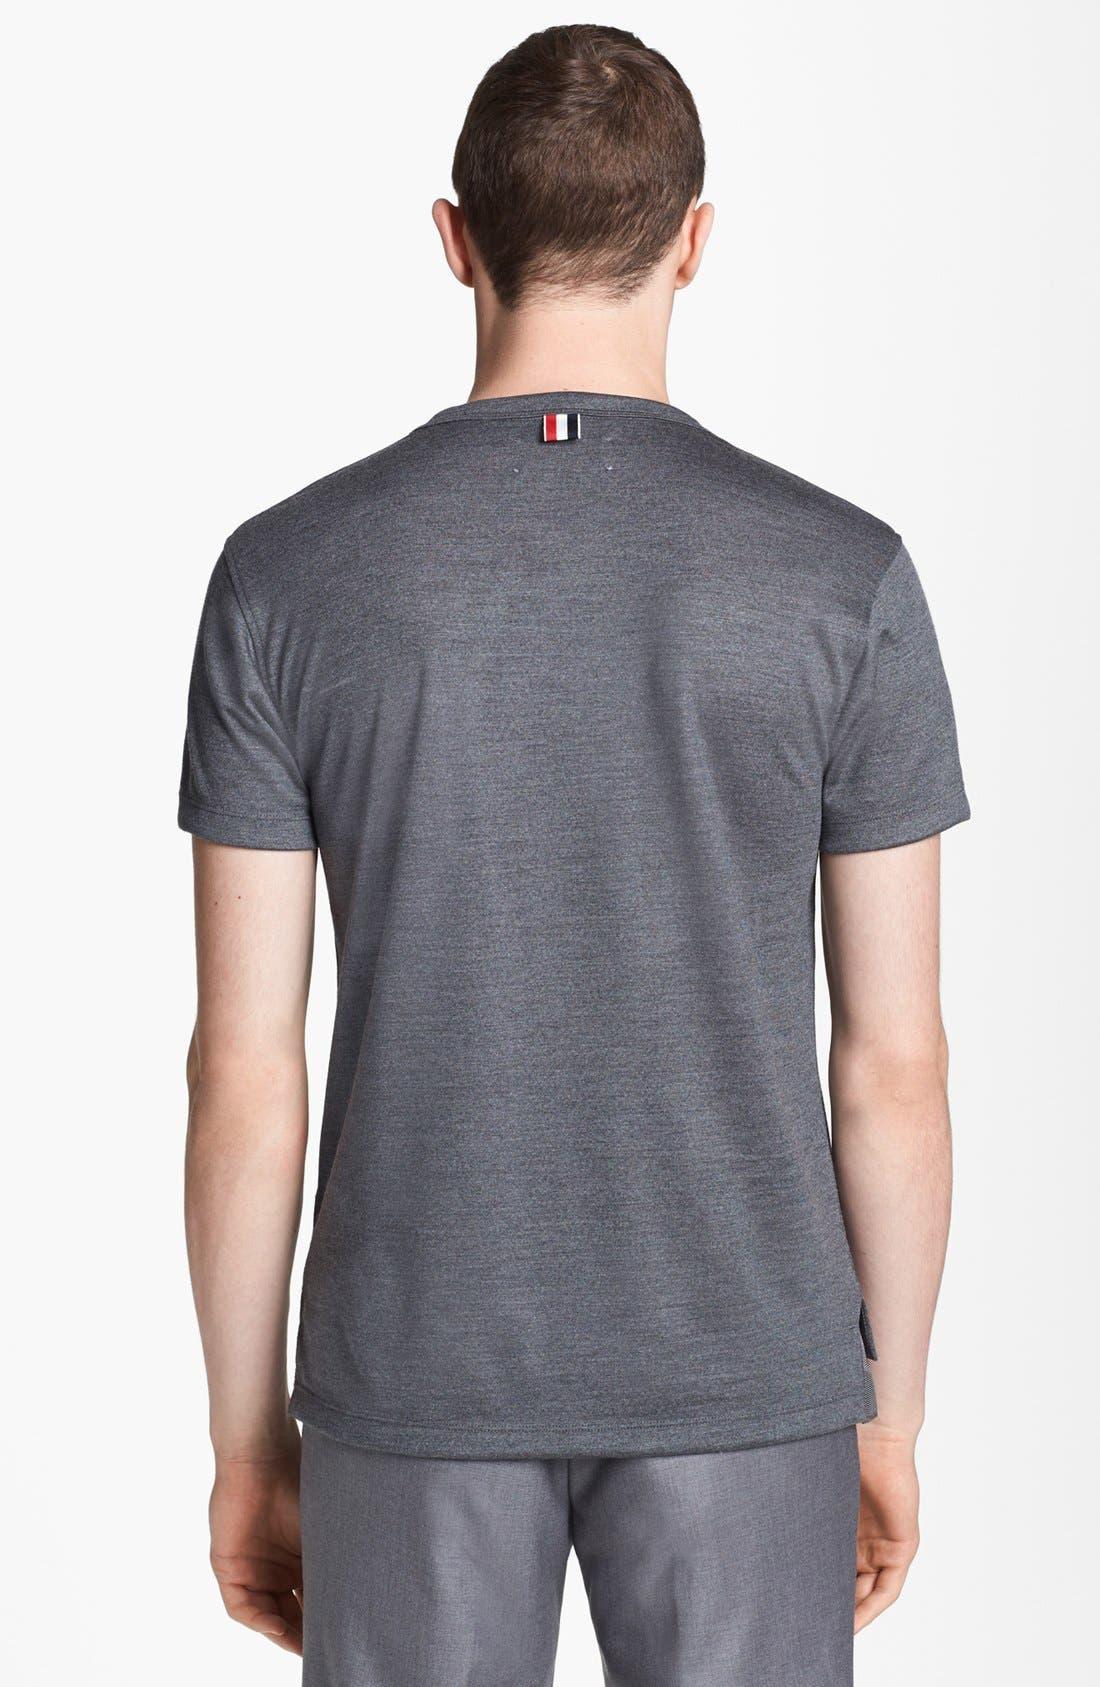 Alternate Image 2  - Thom Browne Merino Wool Pocket T-Shirt